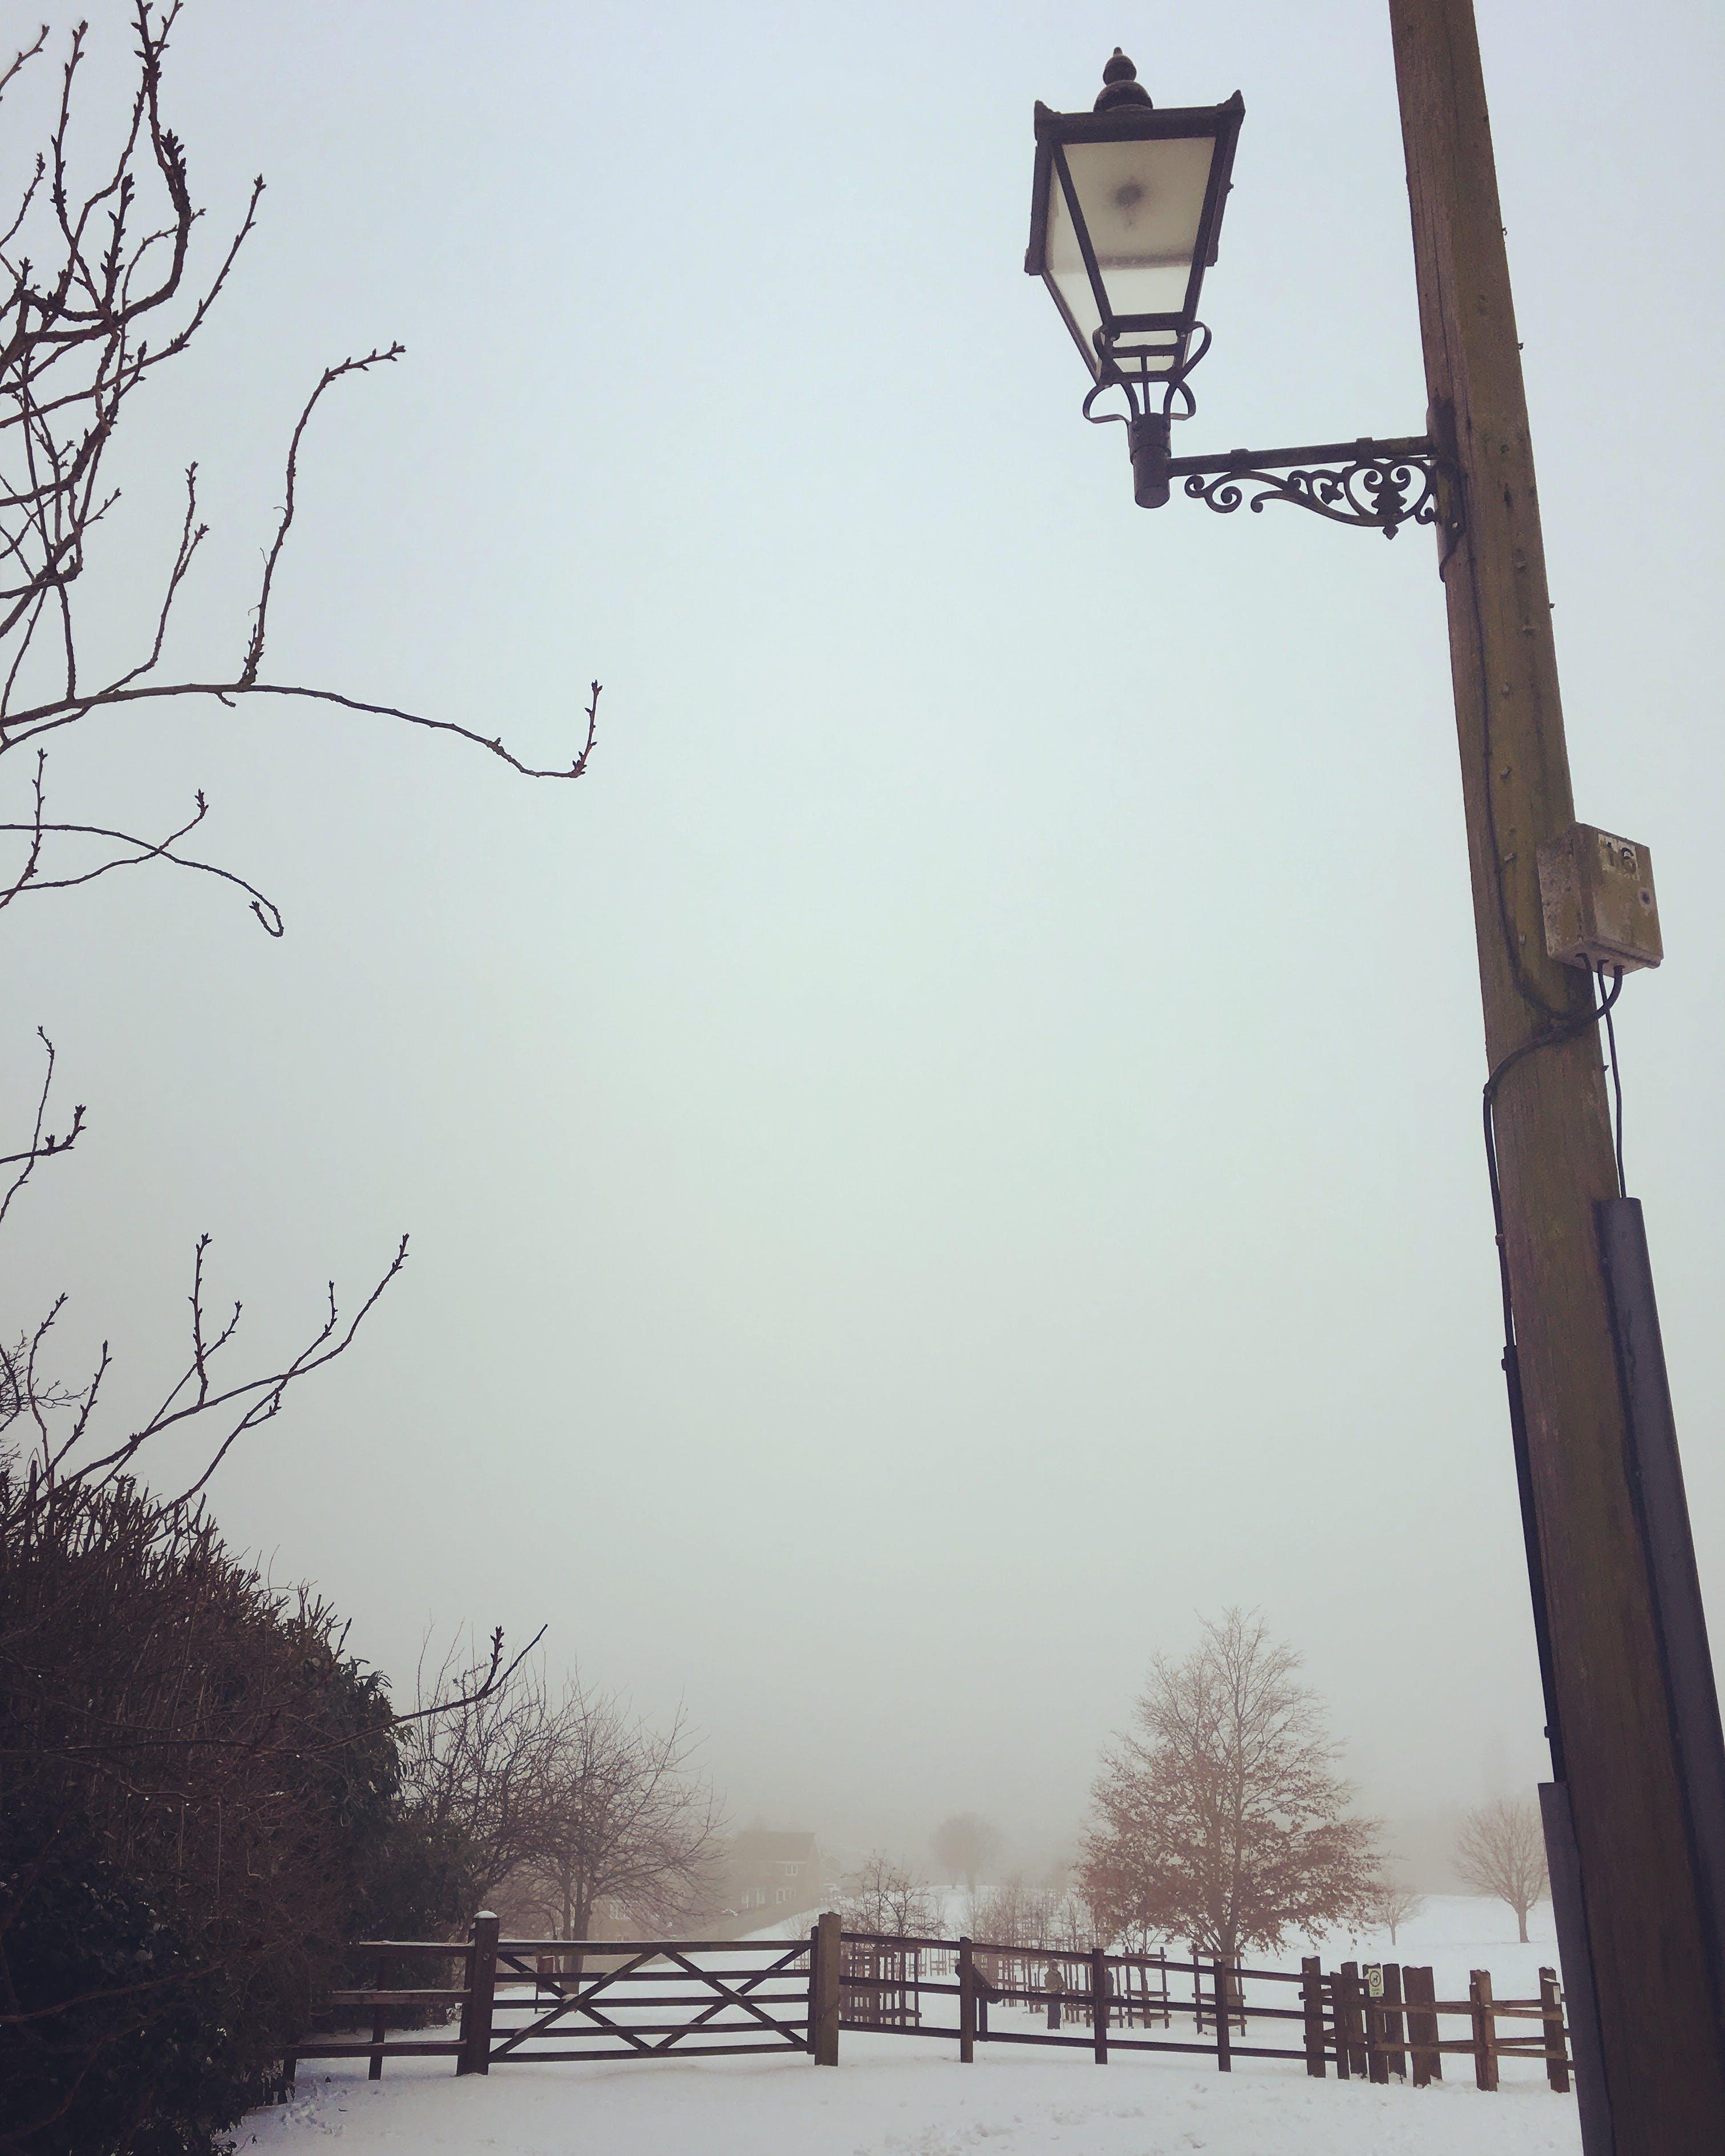 Free stock photo of lamppost, Narnia Lampost, snow, winter